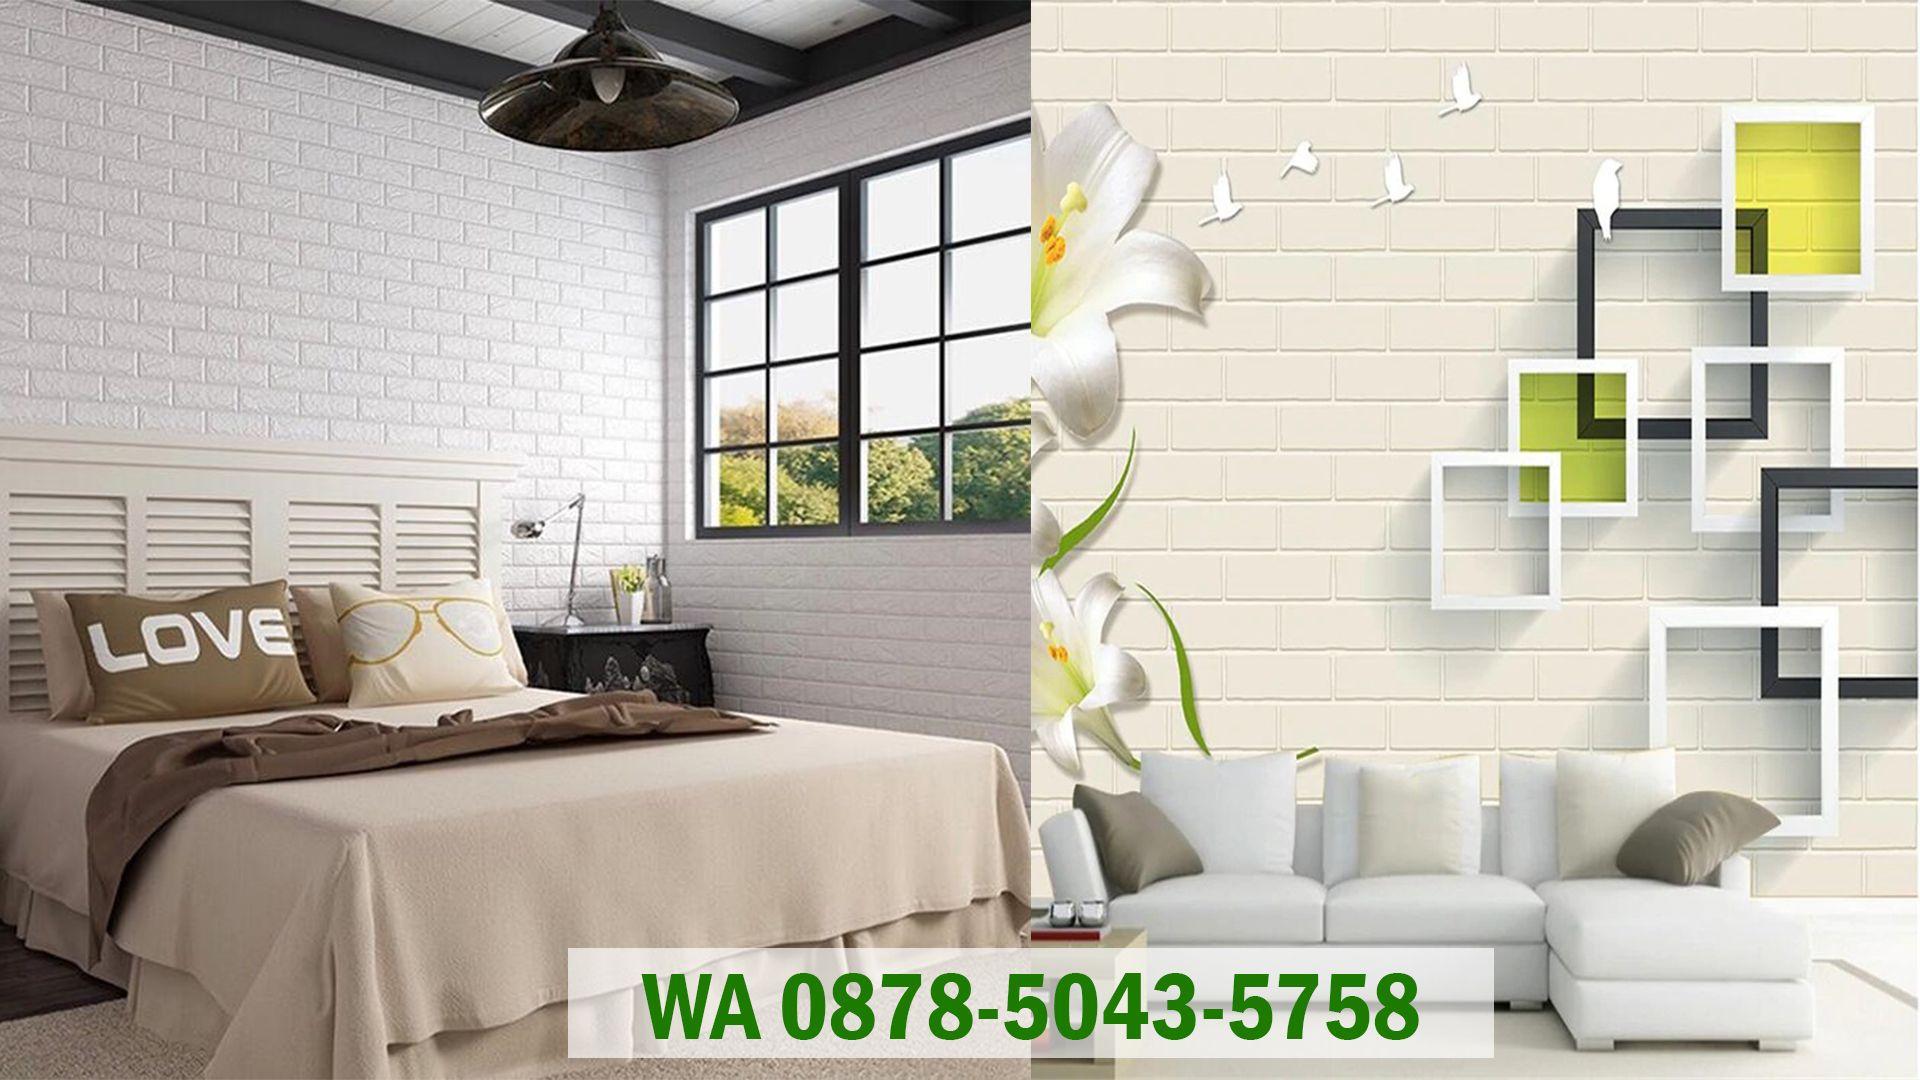 Wallpaper Dinding Bata Putih Wa 0878 5043 5758 Wallpaper Dinding Dinding Bata Dinding